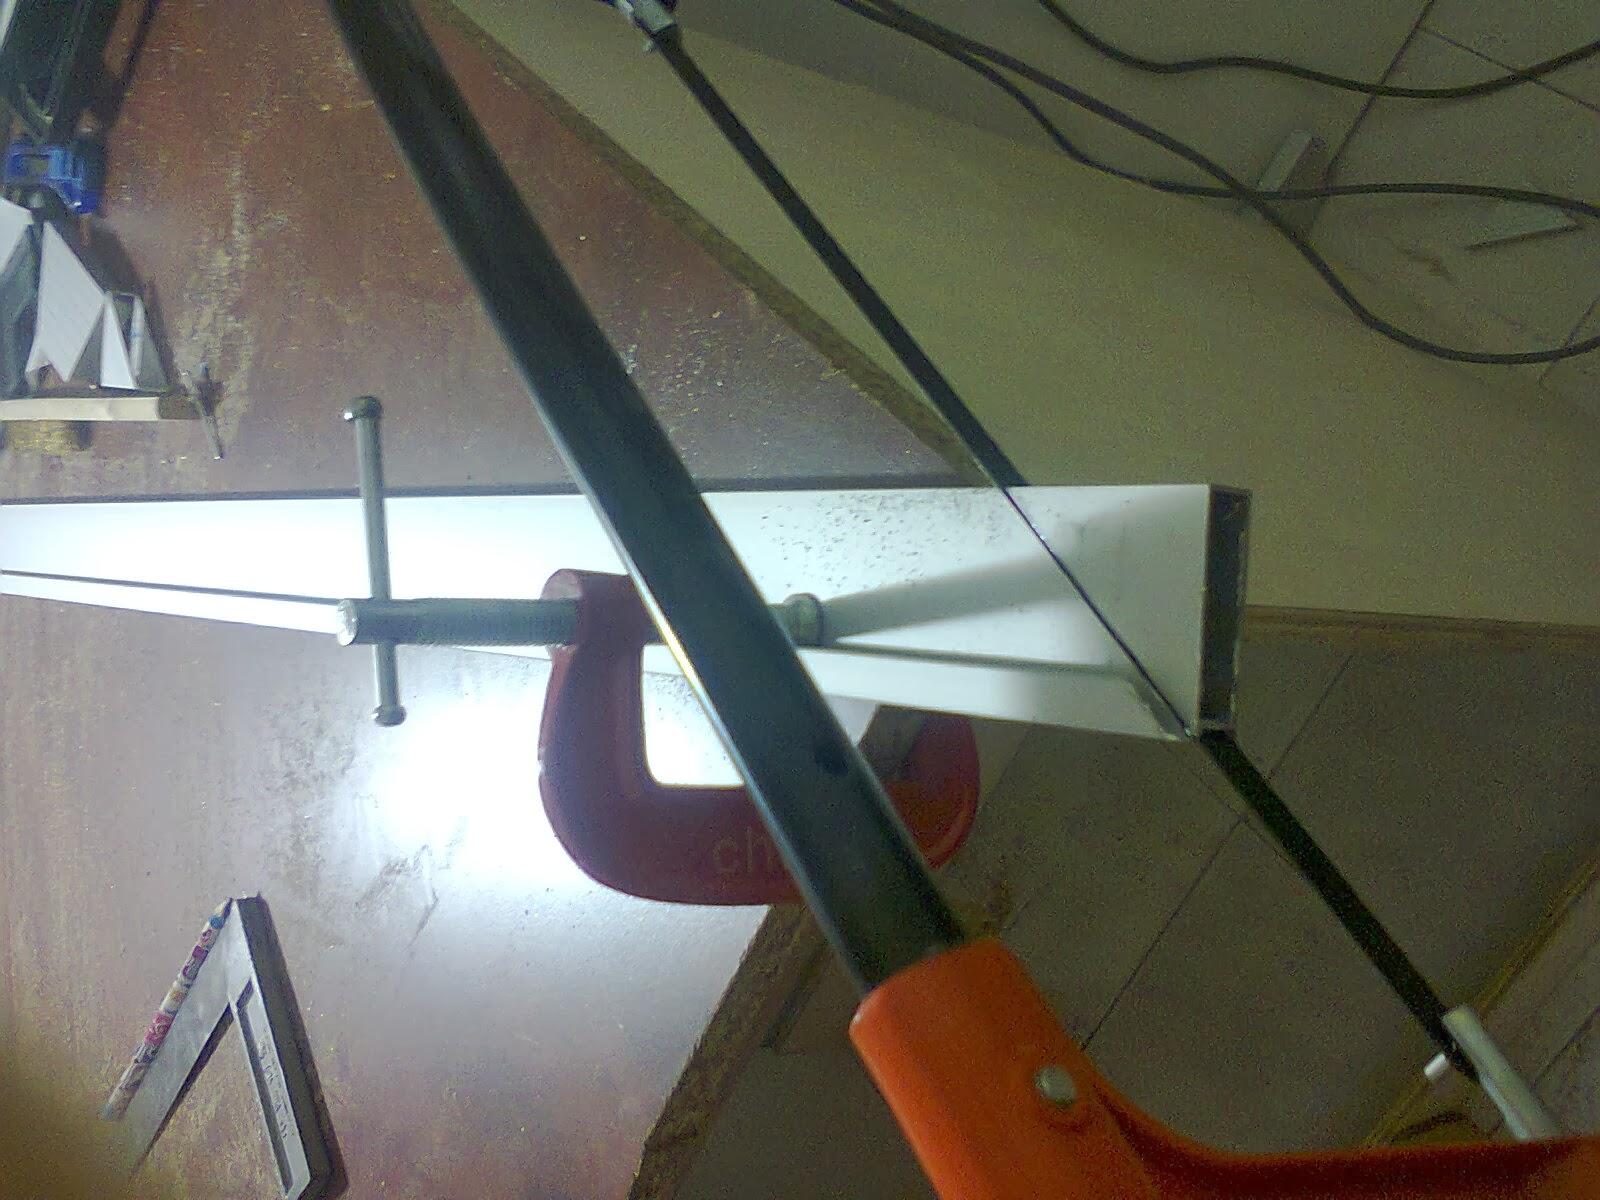 Proses Buat Frame Pintu 3g Kabinet Dapur Guna Gergaji Tangan Lebih Mudah Dan Lurus Mesin Agak Susah Berdesing Bunyi Dia